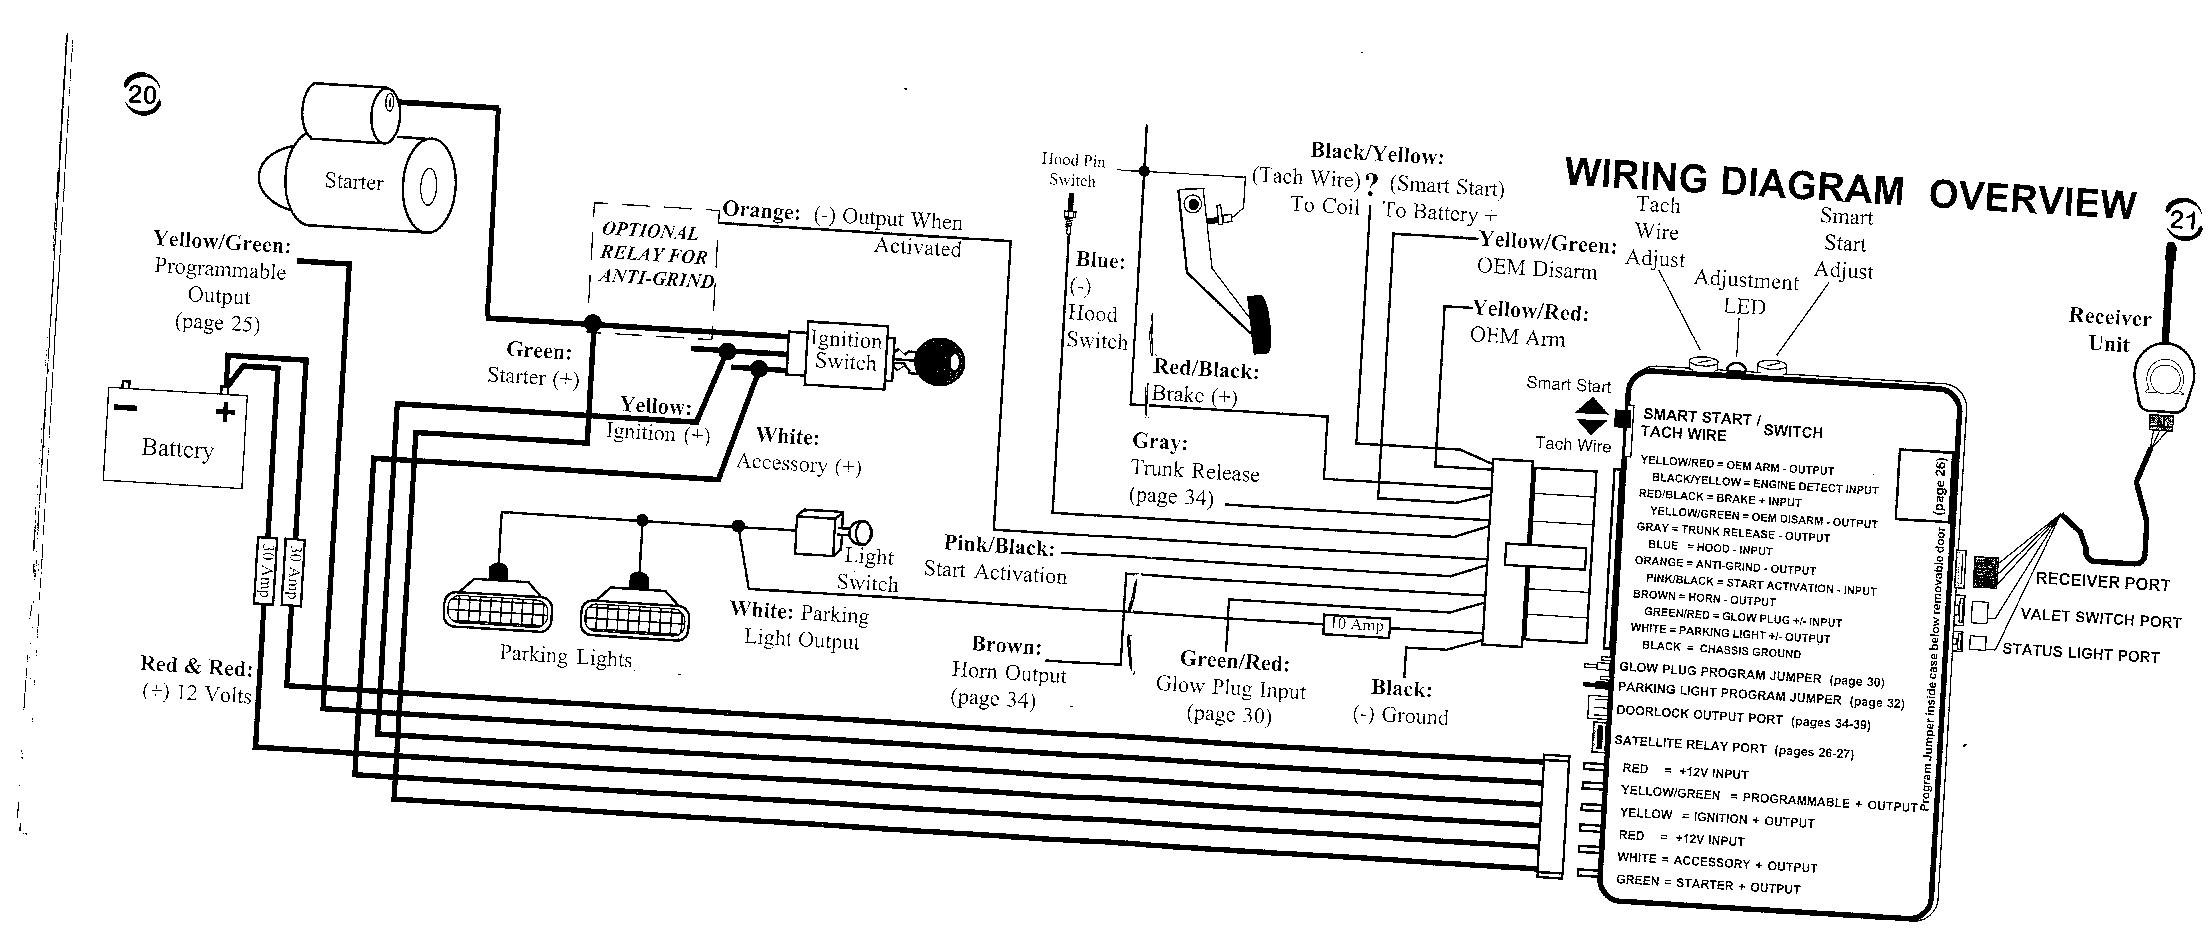 DIAGRAM] Viper 5704v Wiring Diagram FULL Version HD Quality Wiring Diagram  - TRACKDIAGRAMS.AGORASUP.FRDiagram Database